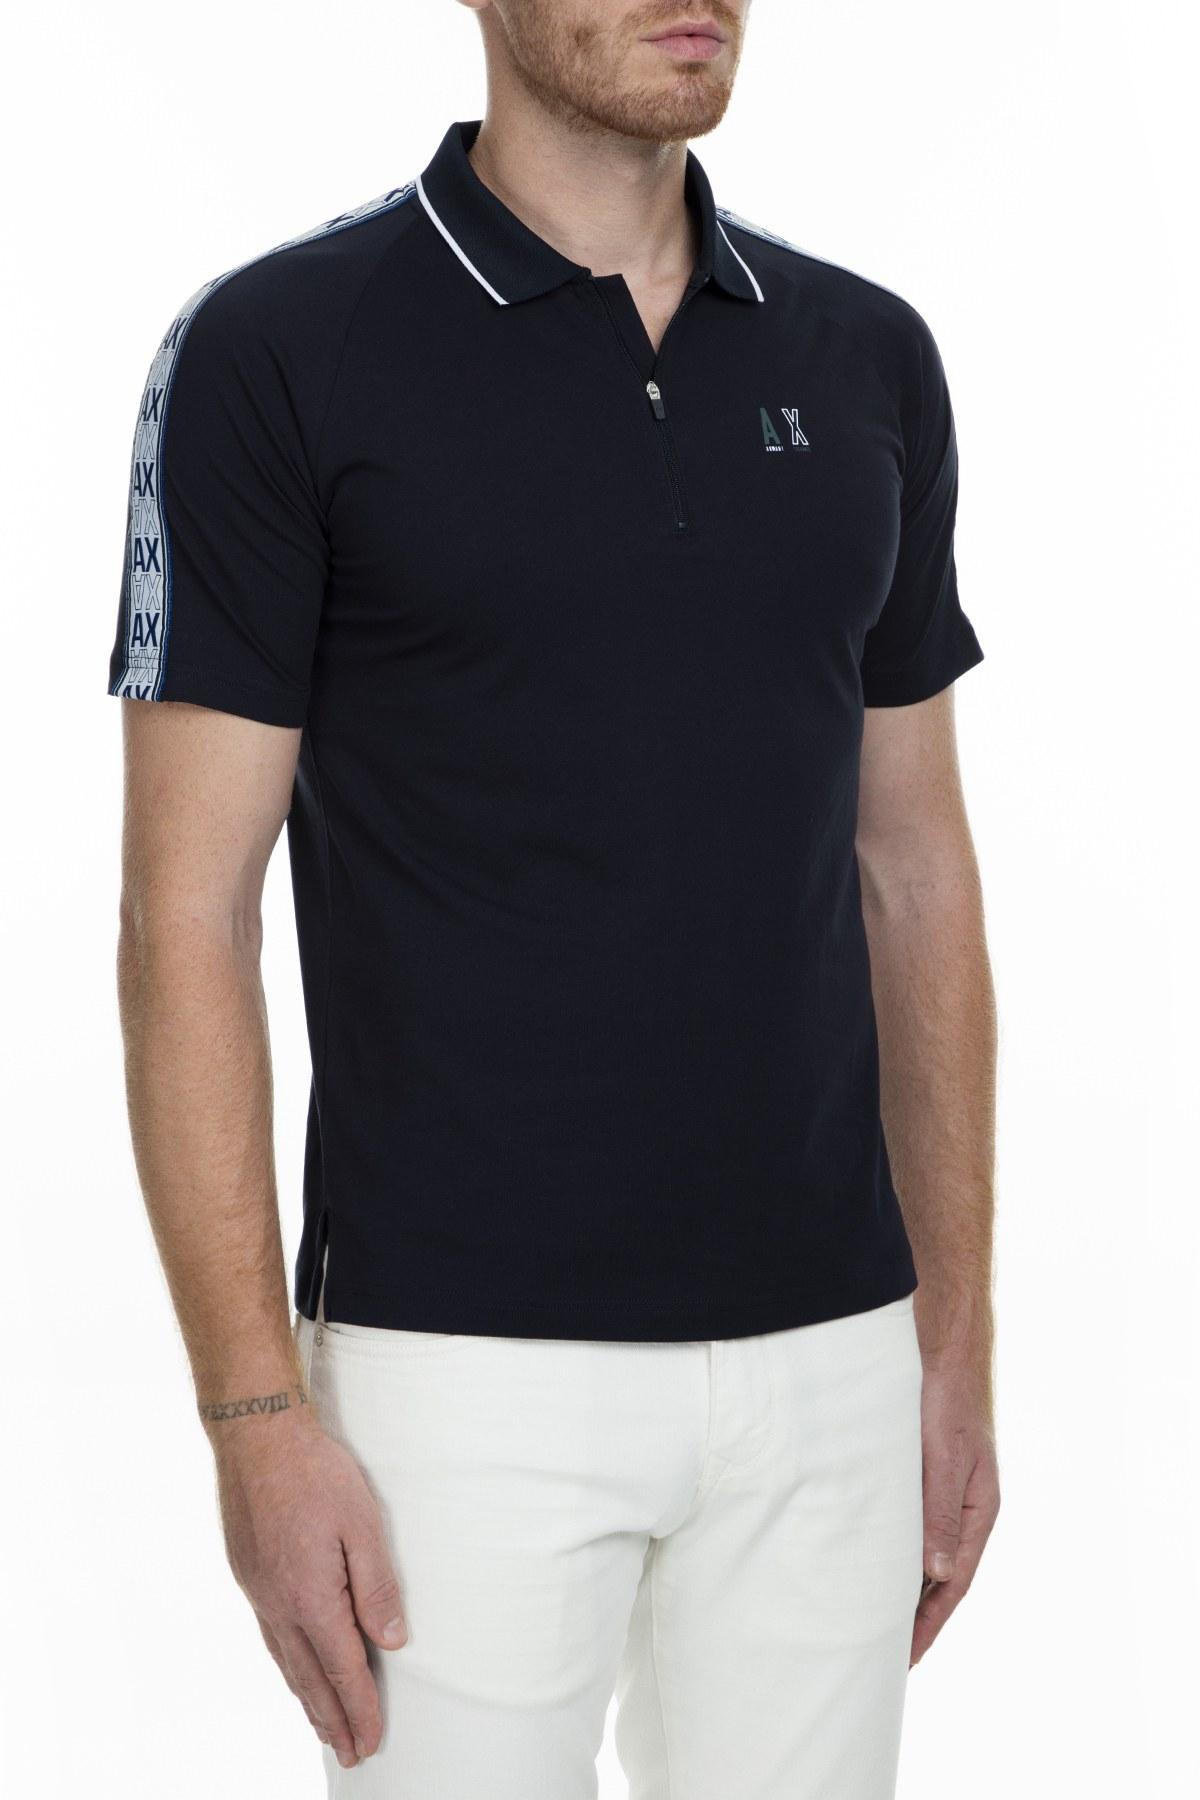 Armani Exchange Regular Fit T Shirt Erkek Polo S 6GZFBE ZJBVZ 1510 LACİVERT